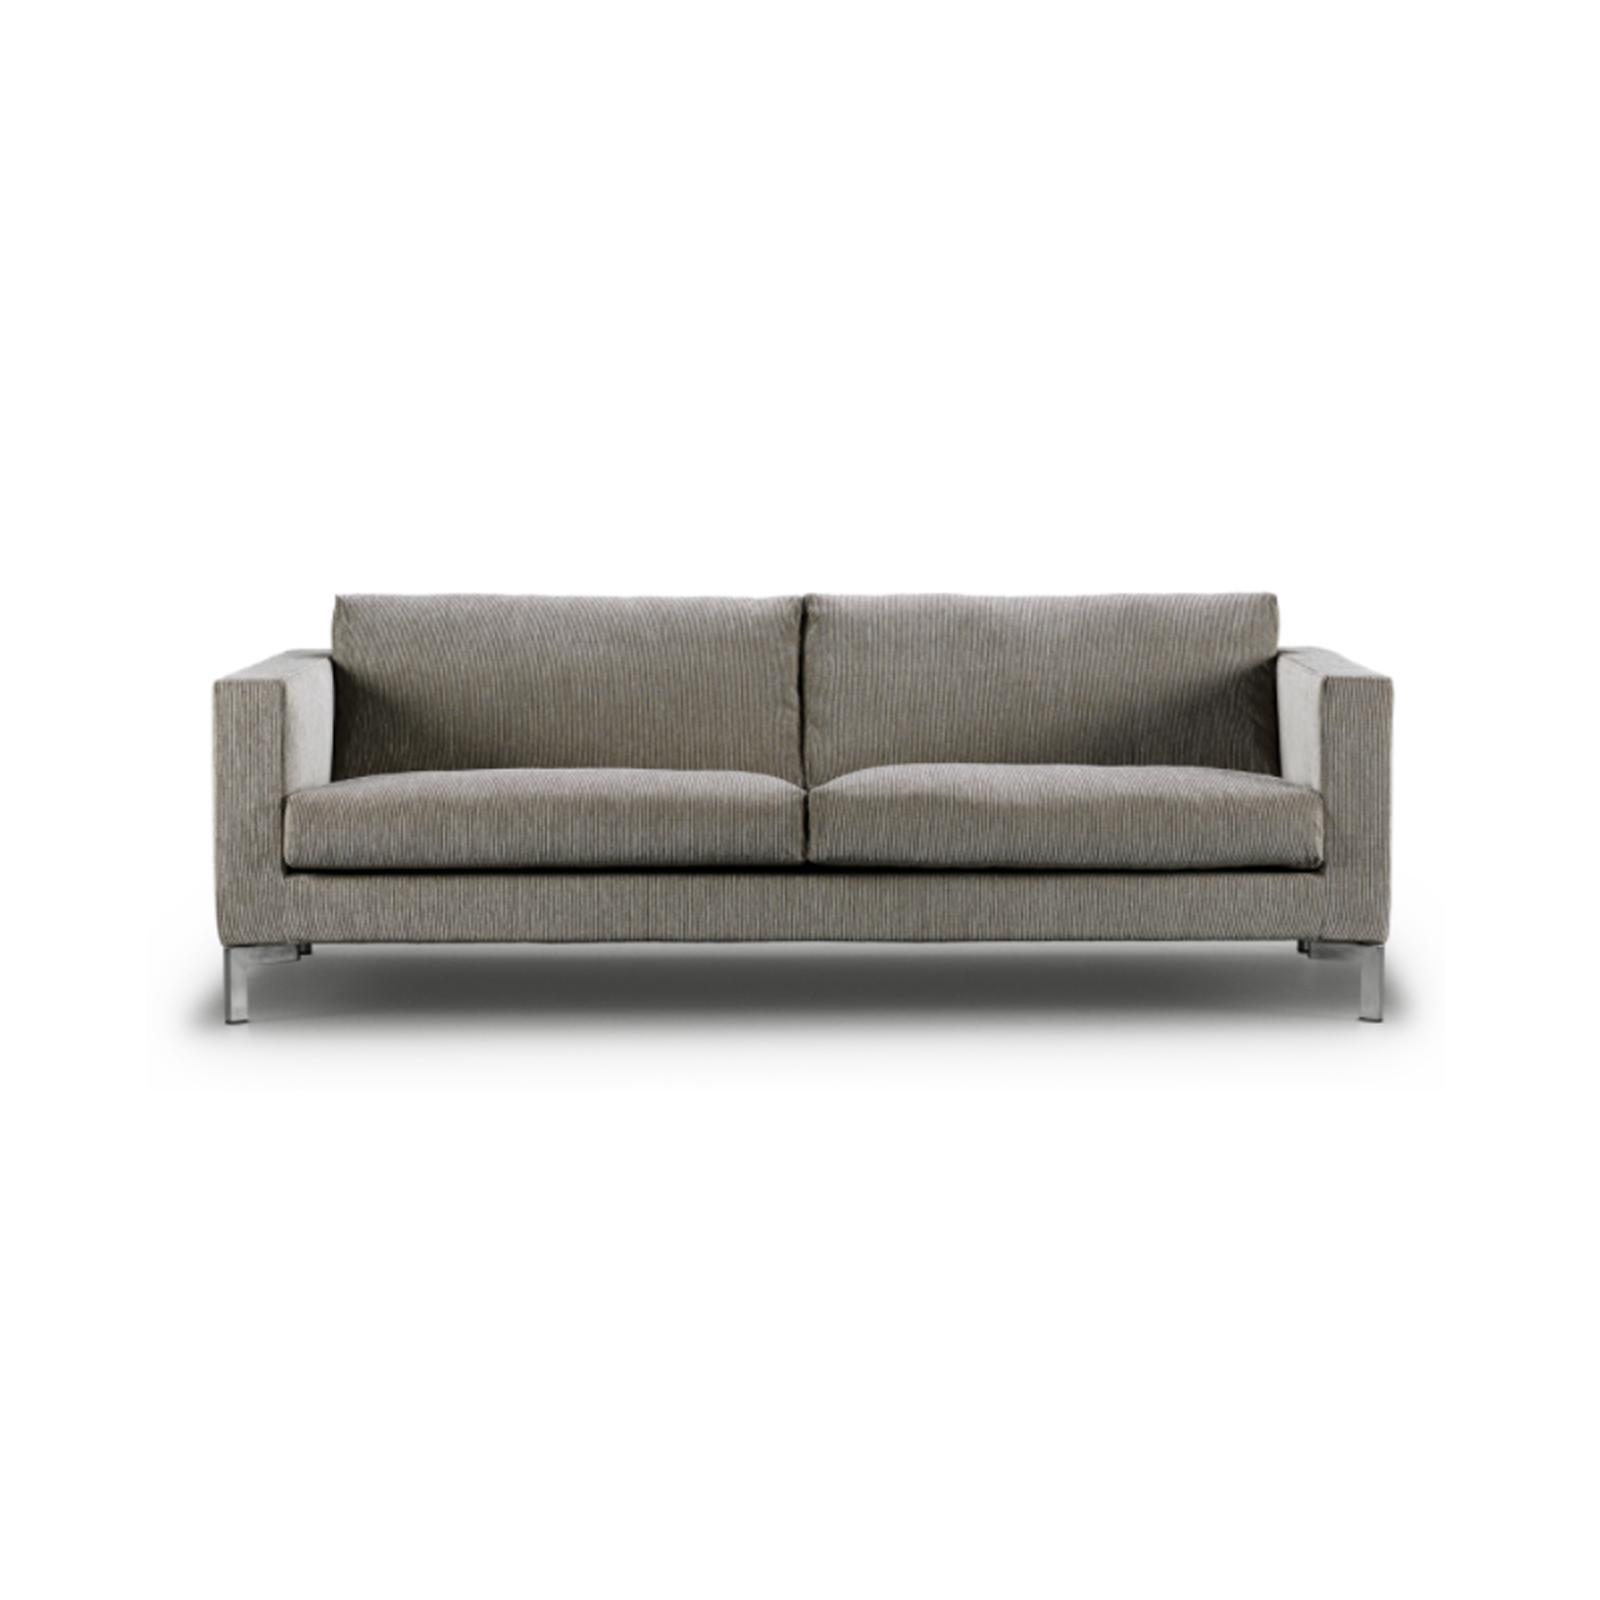 Zenith soffa